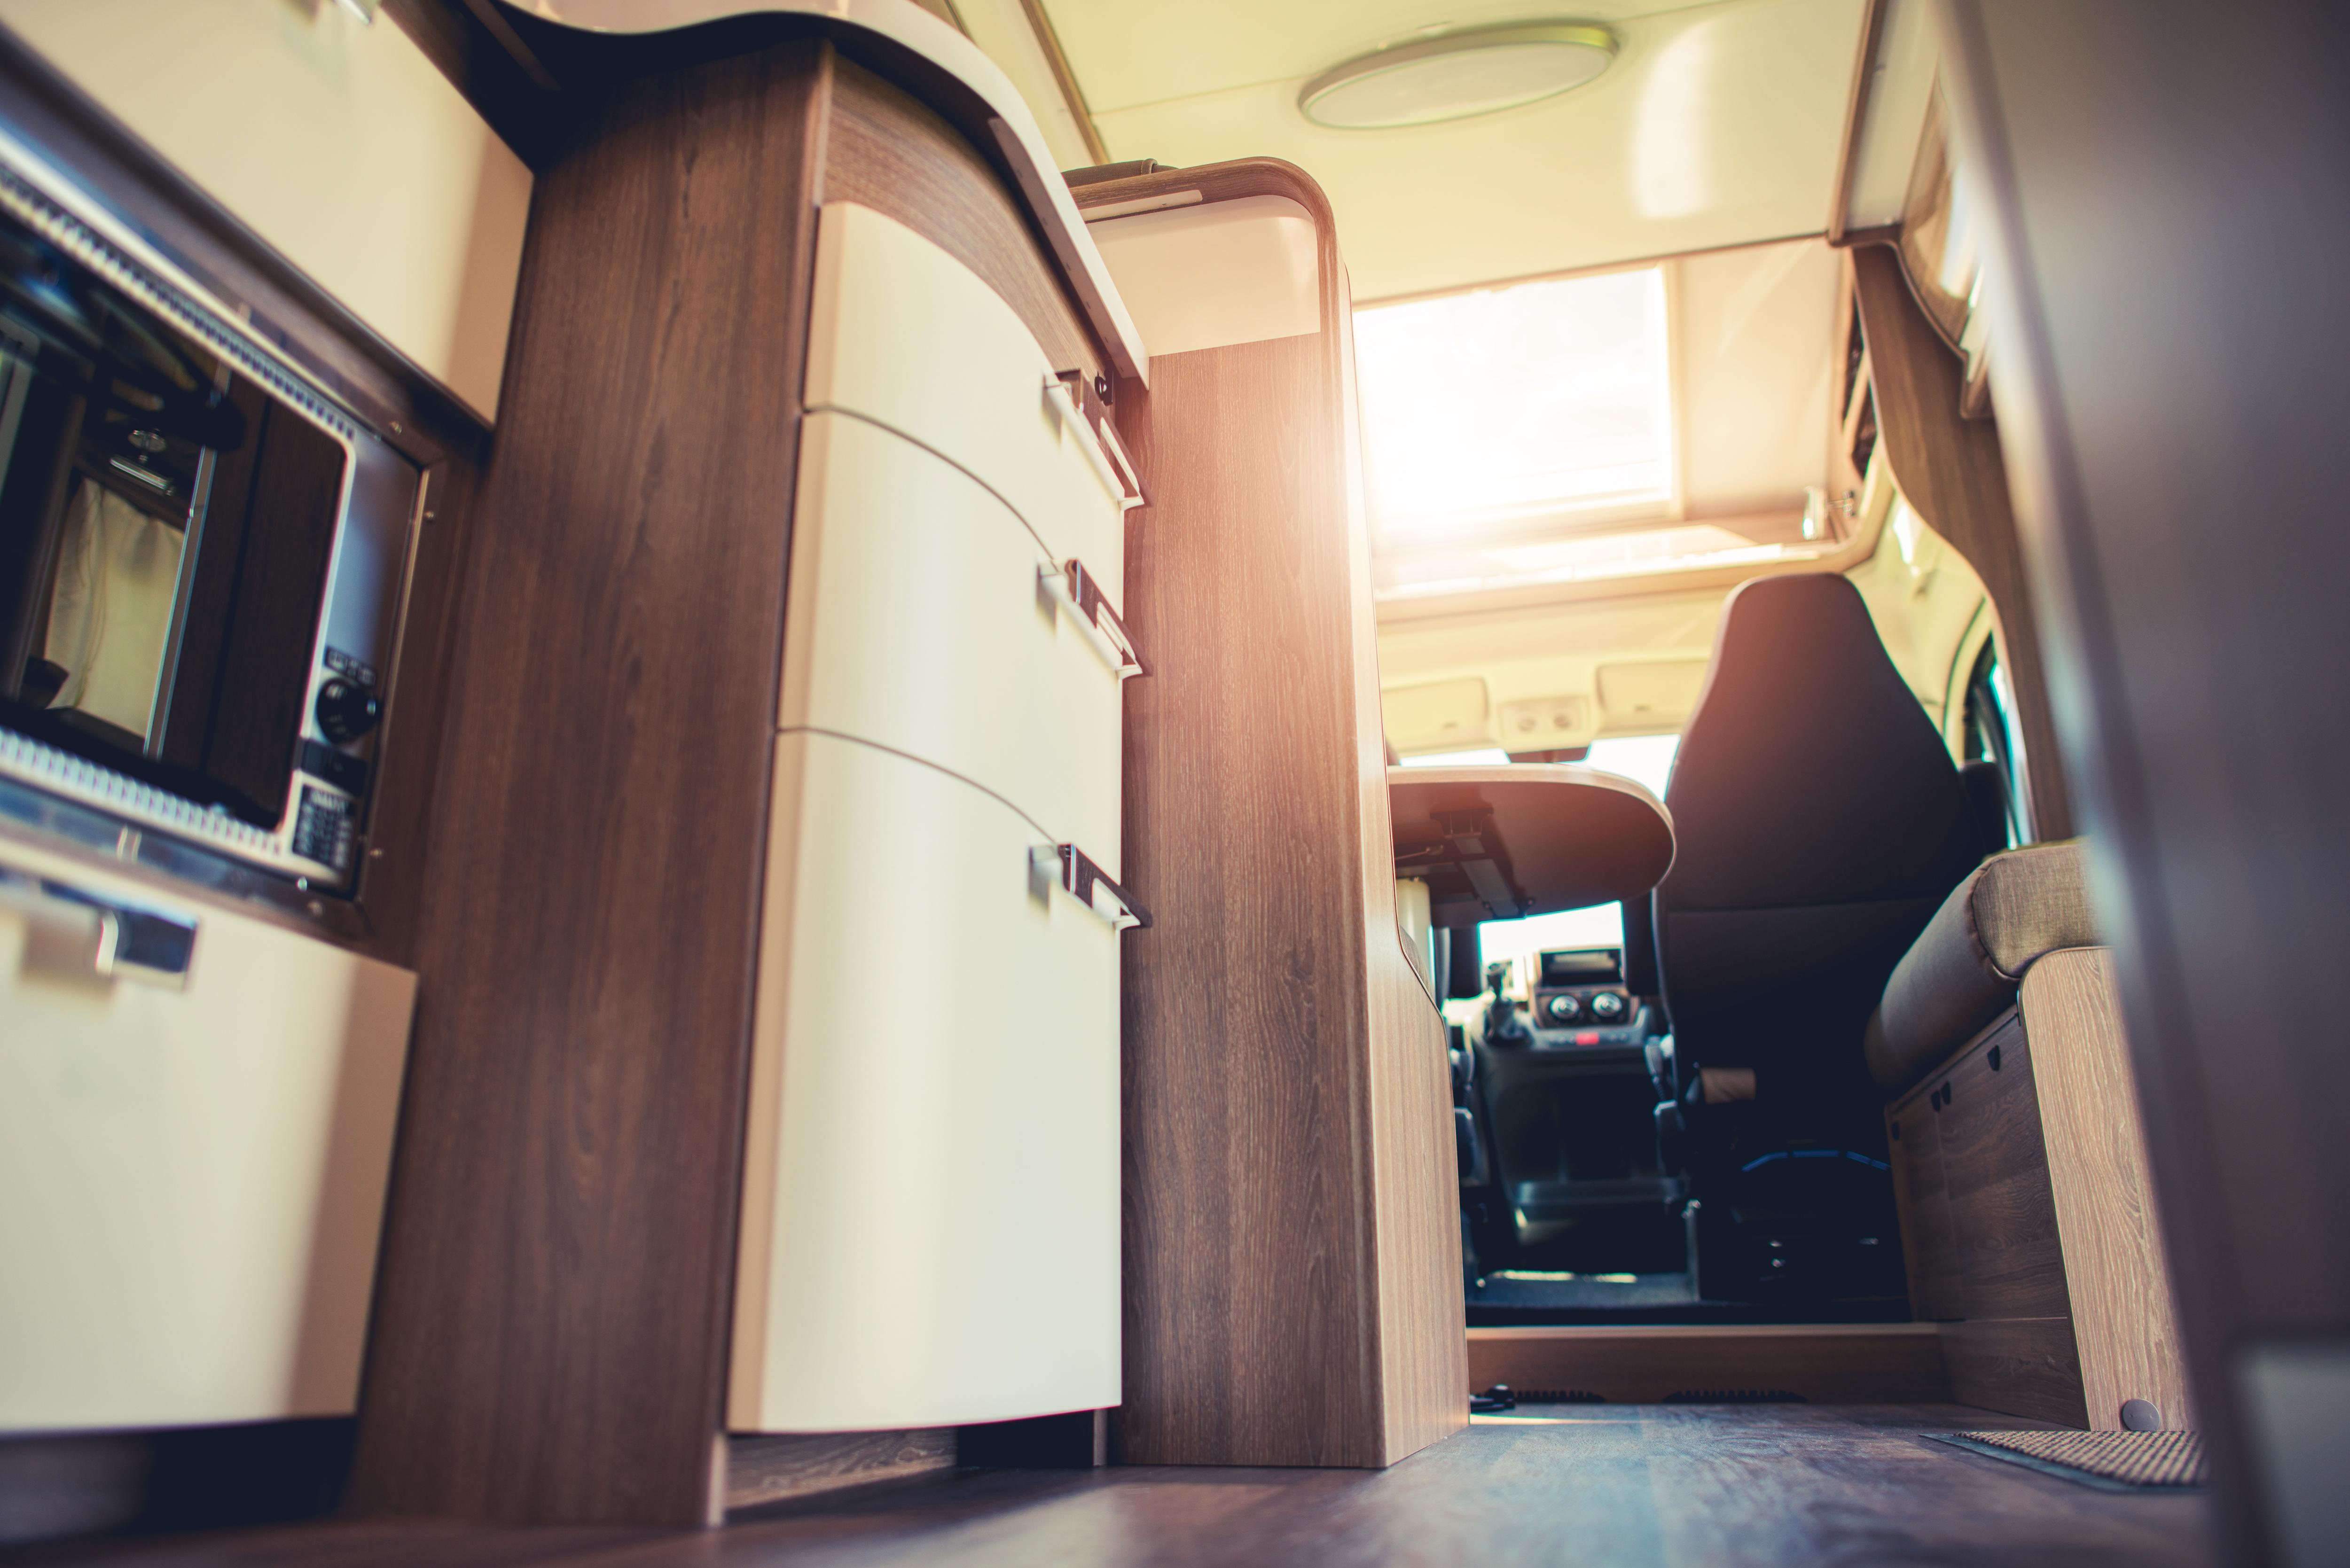 Interiores de autocaravana